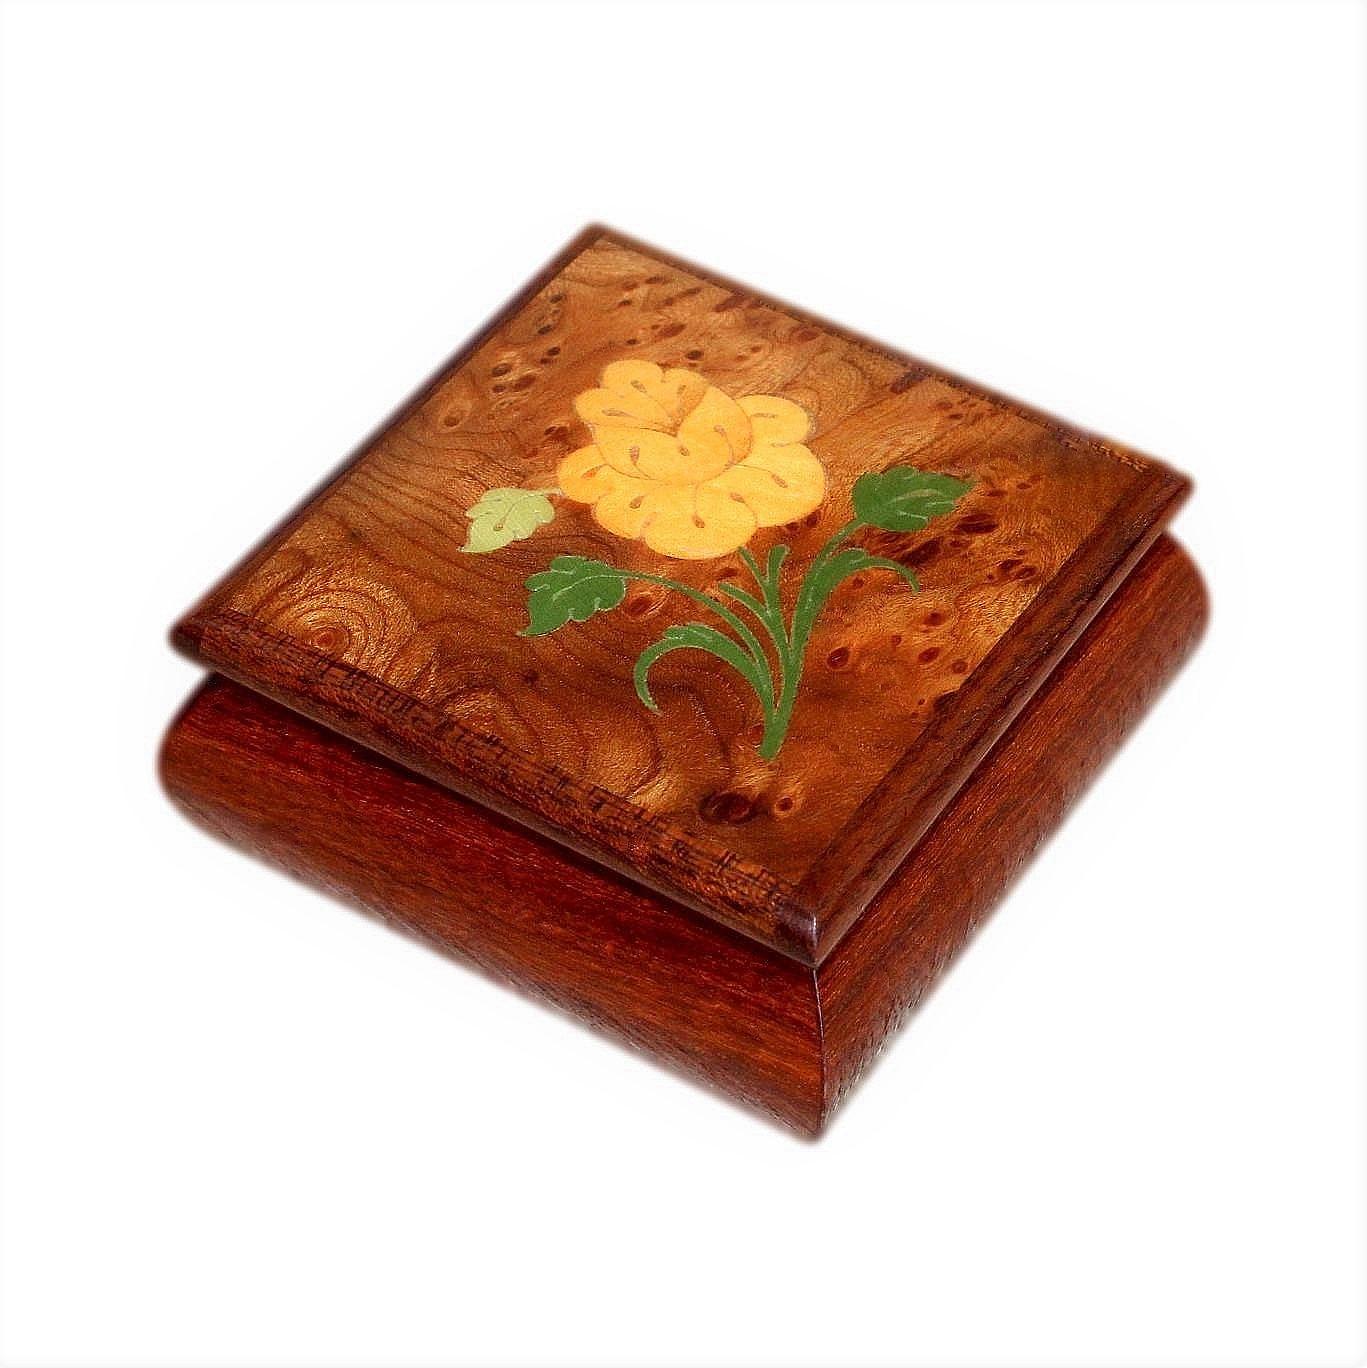 Small Italian Inlaid Vintage Jewellery Box From Sorrento